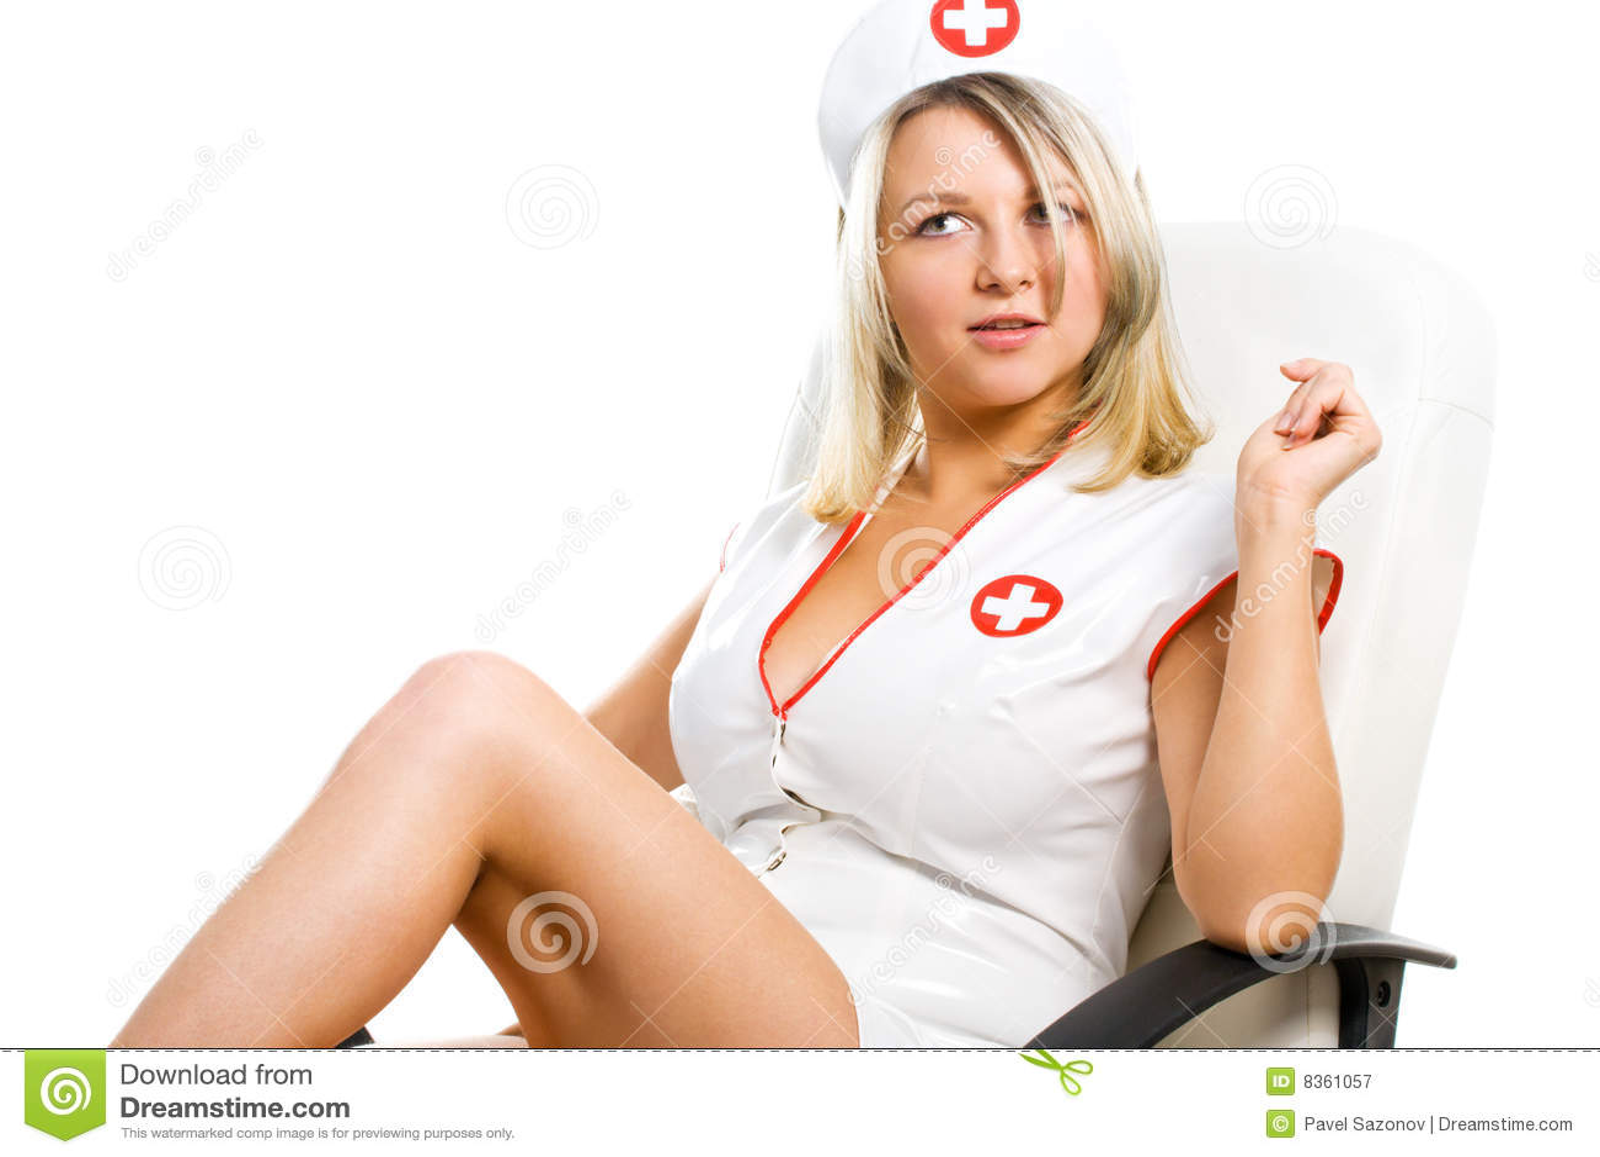 Vidéos d'infirmière sexy bigtit